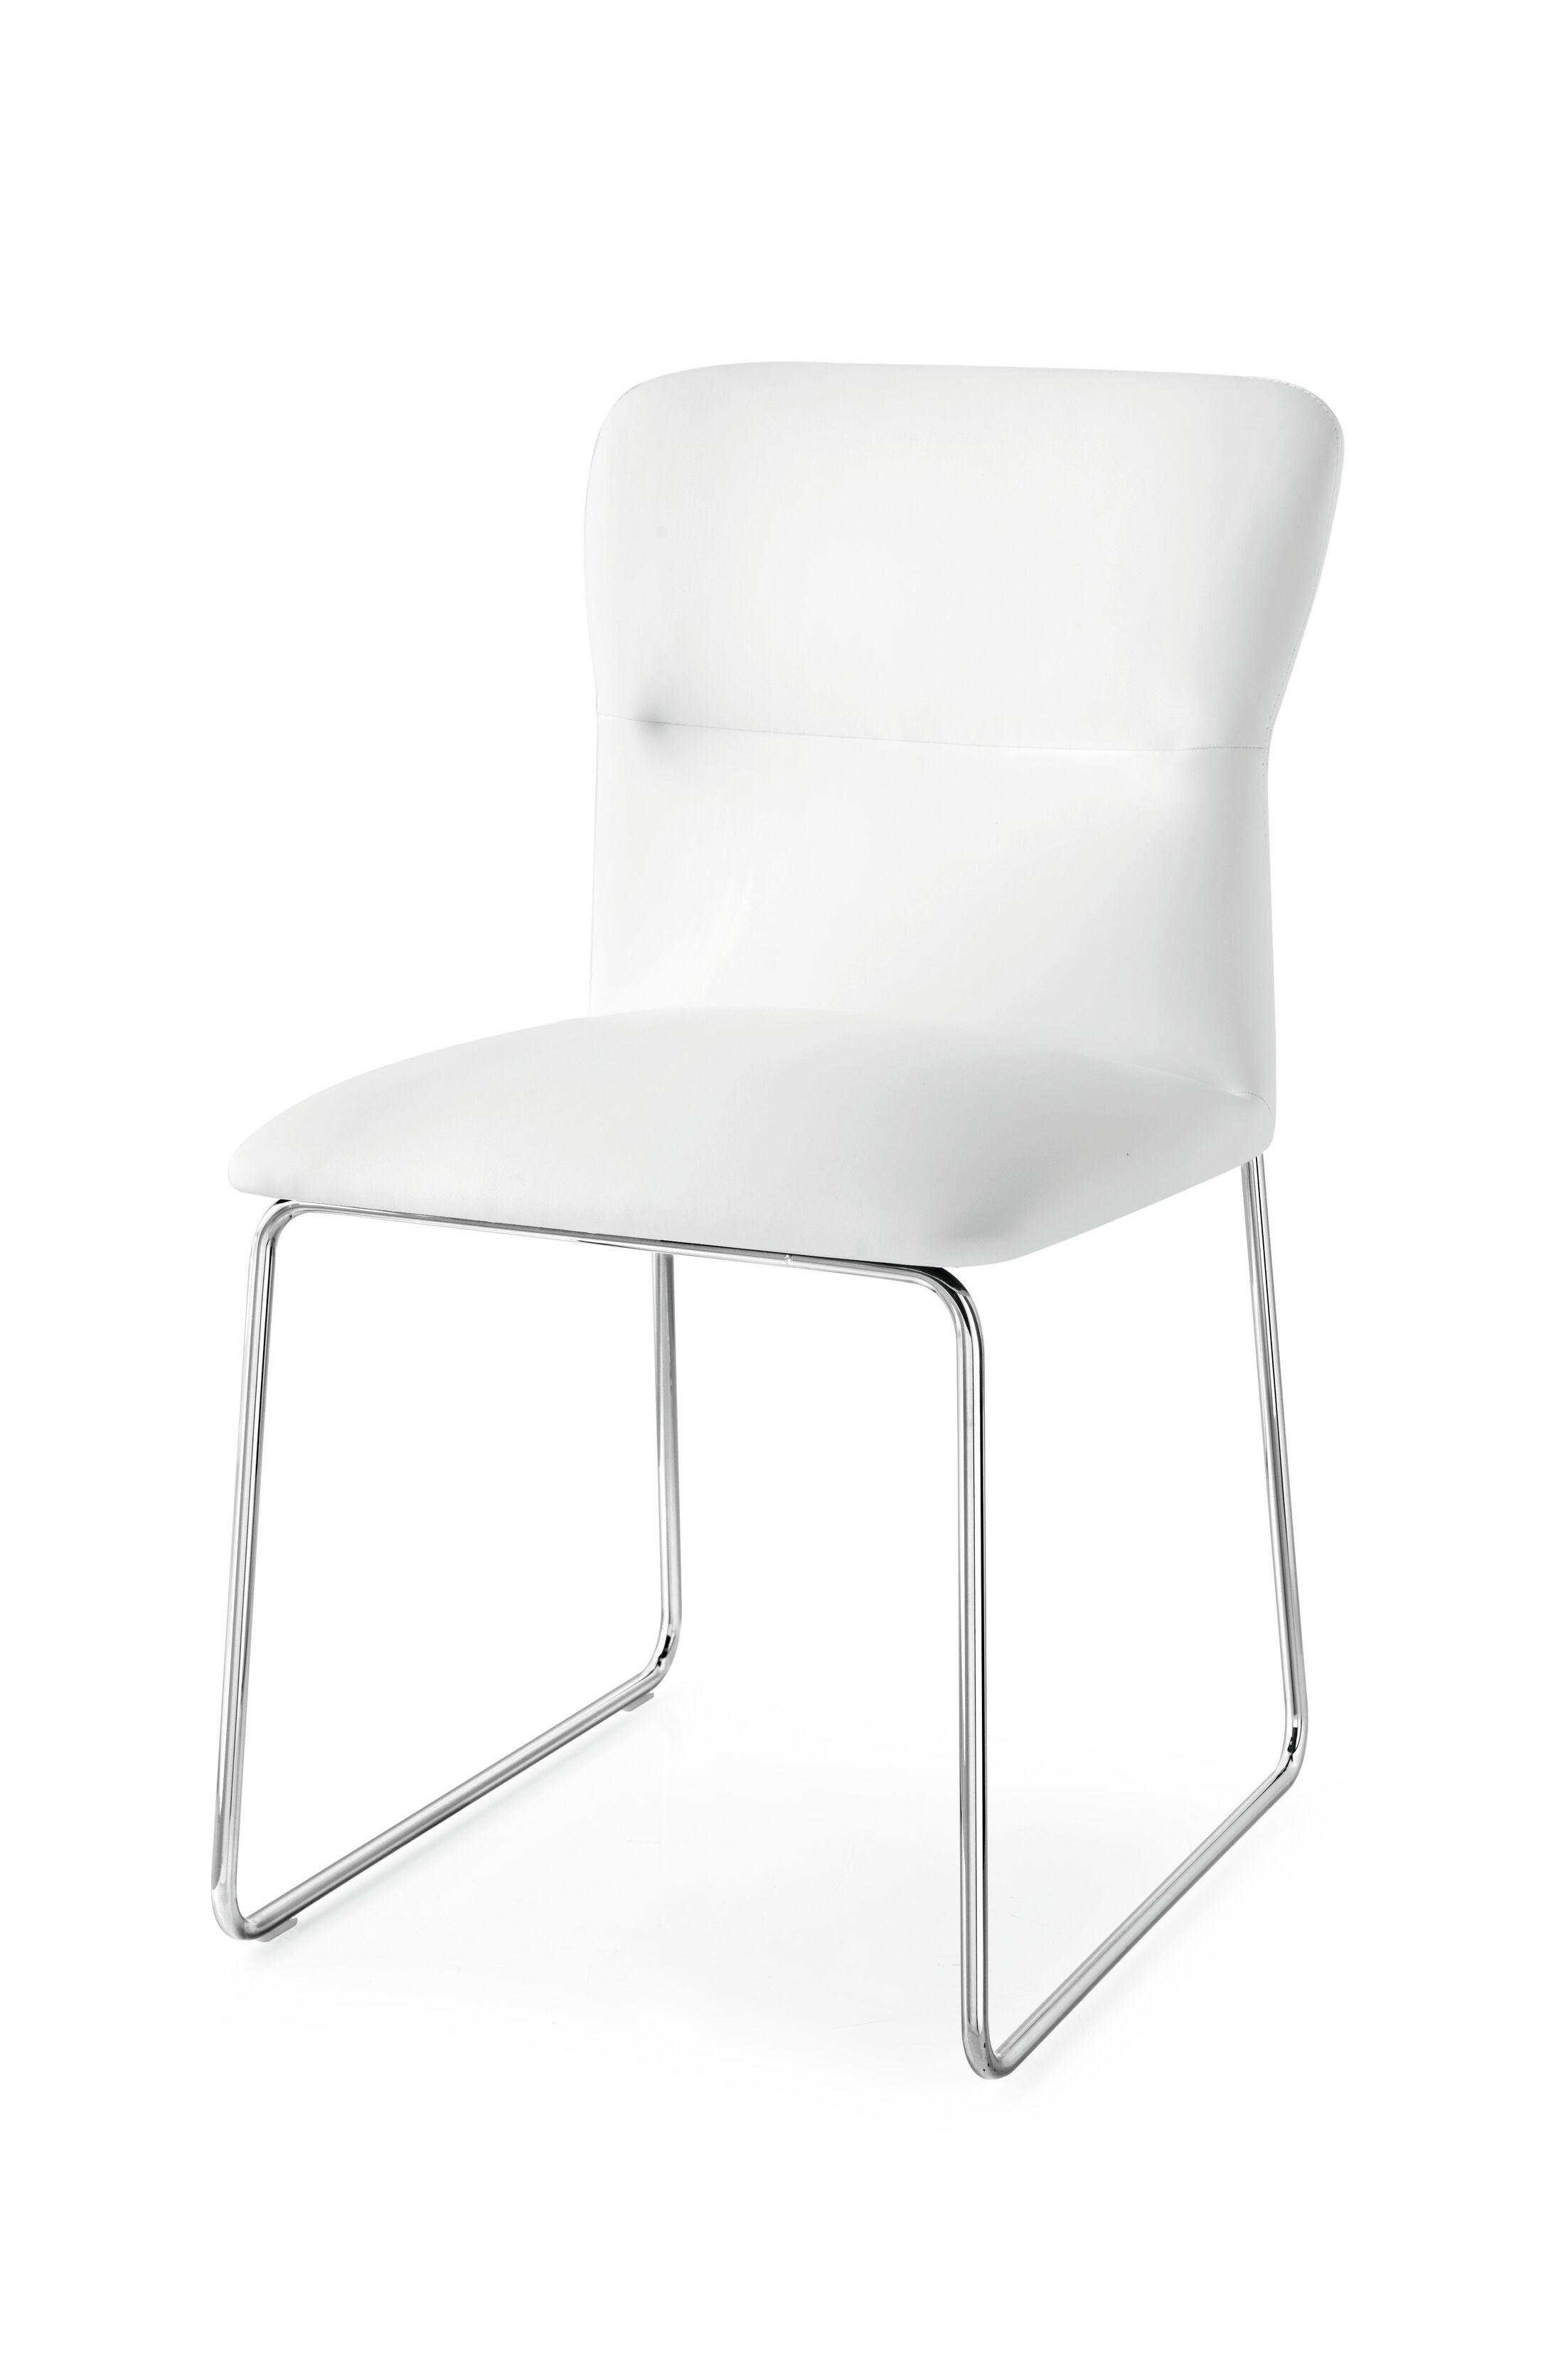 Mclea Upholstered Side Chair Upholstery Color: Skuba Optic White